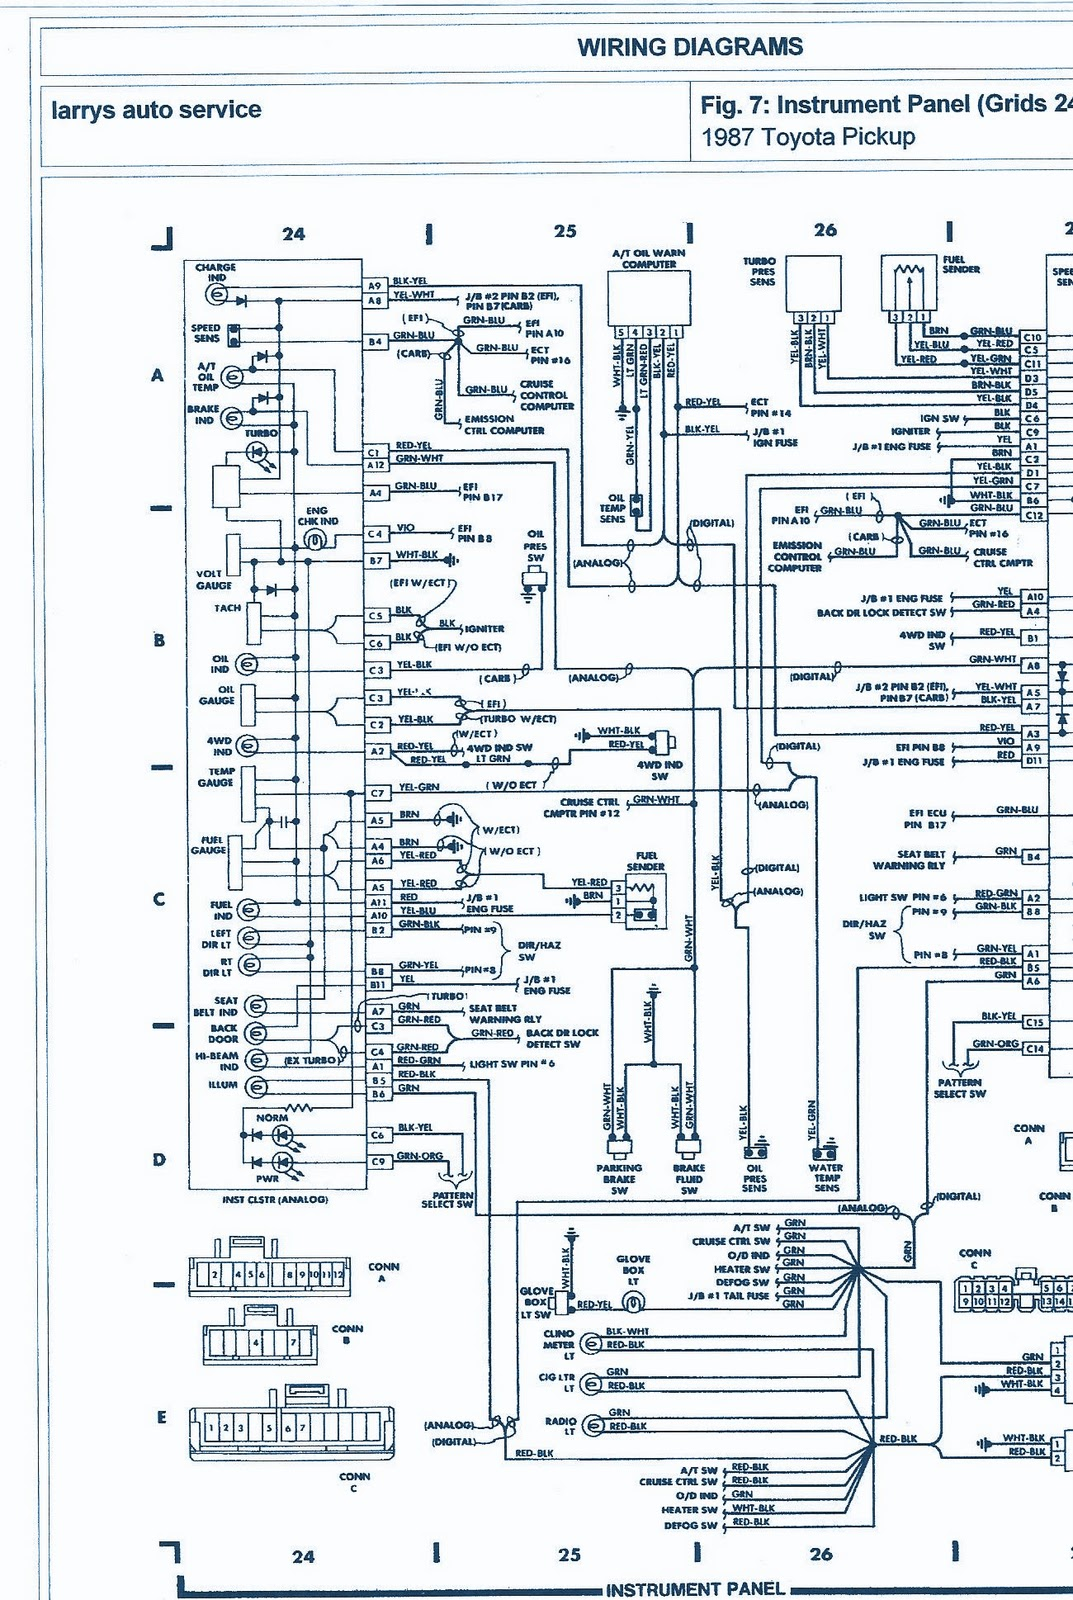 1994 Toyota Pickup Ignition Wiring Diagram  Somurich